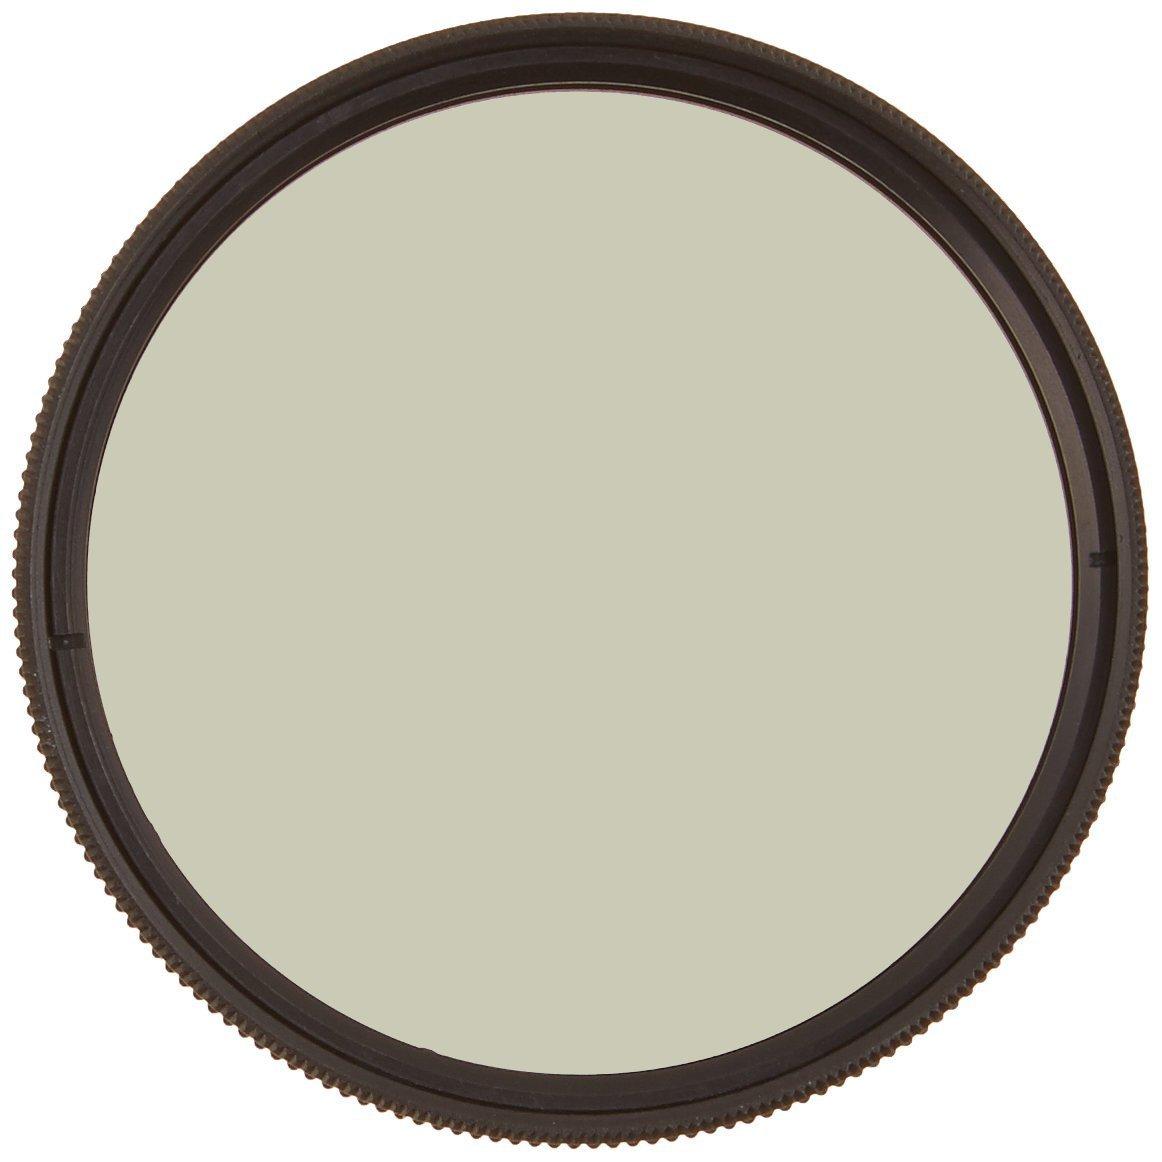 58 mm Basics UV Protection Filter